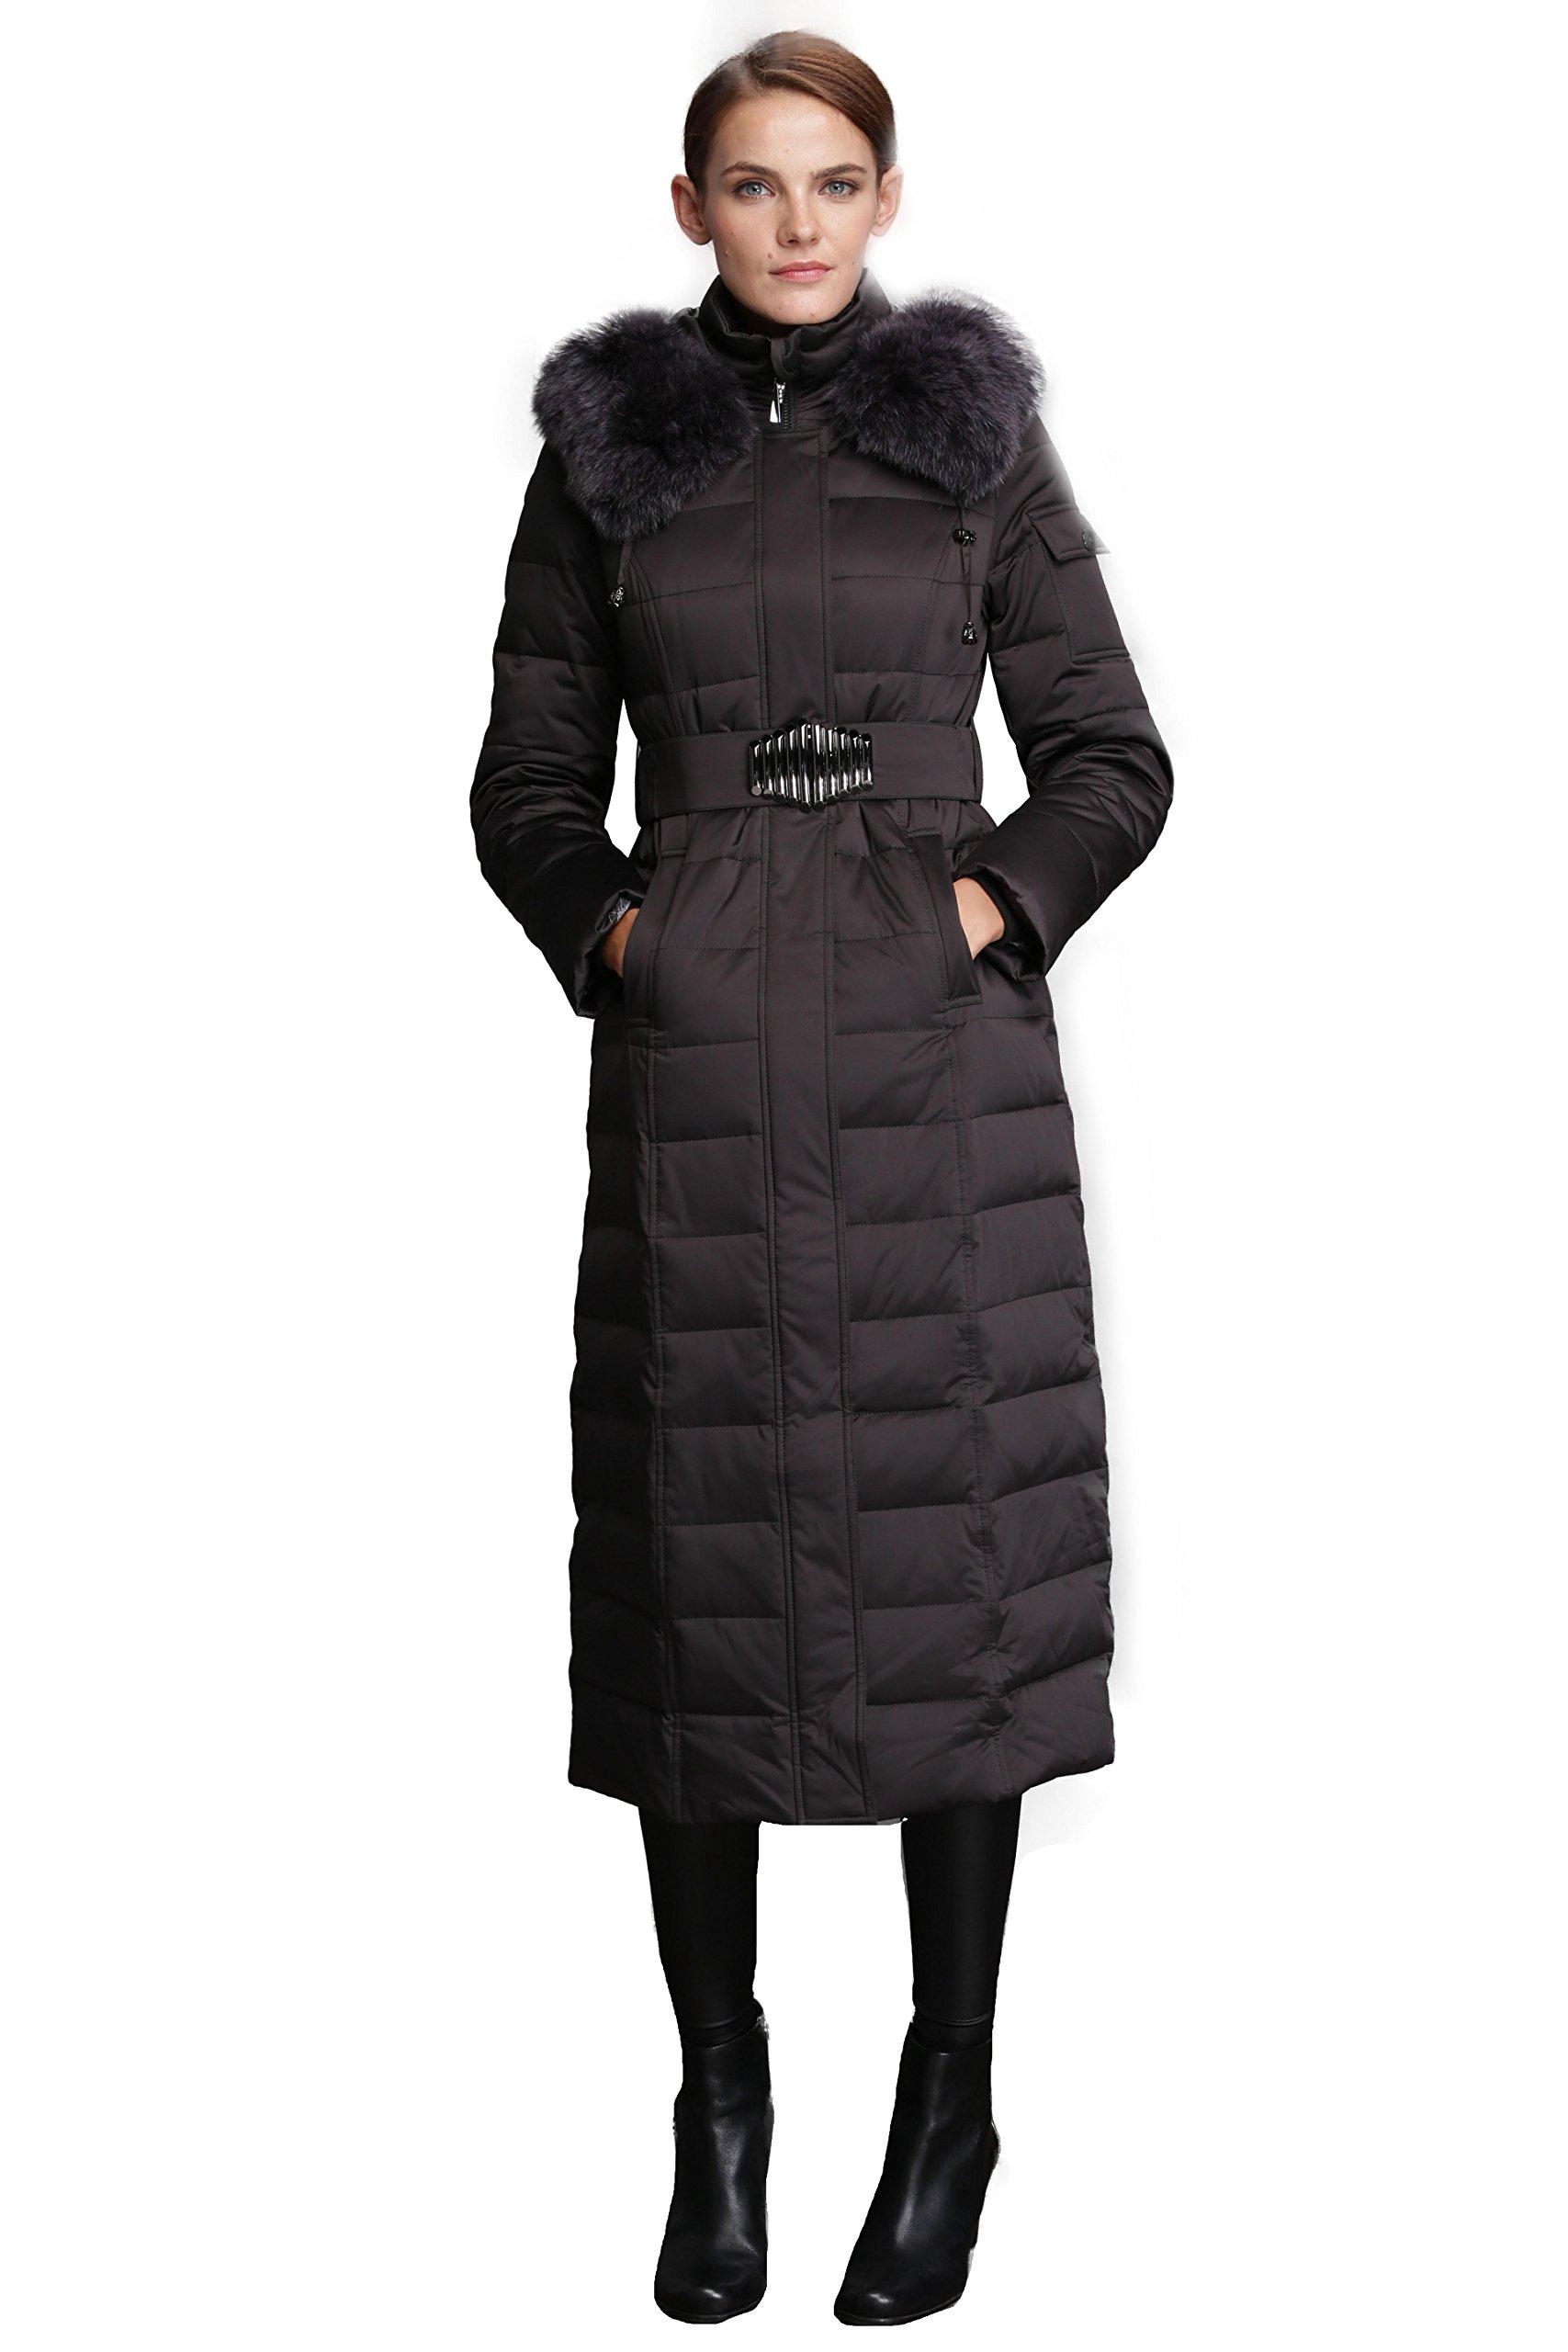 Fast Sister Women's Stylish Goose Down Jackets Down Coats Parka Fox Fur Collar -XXL Black